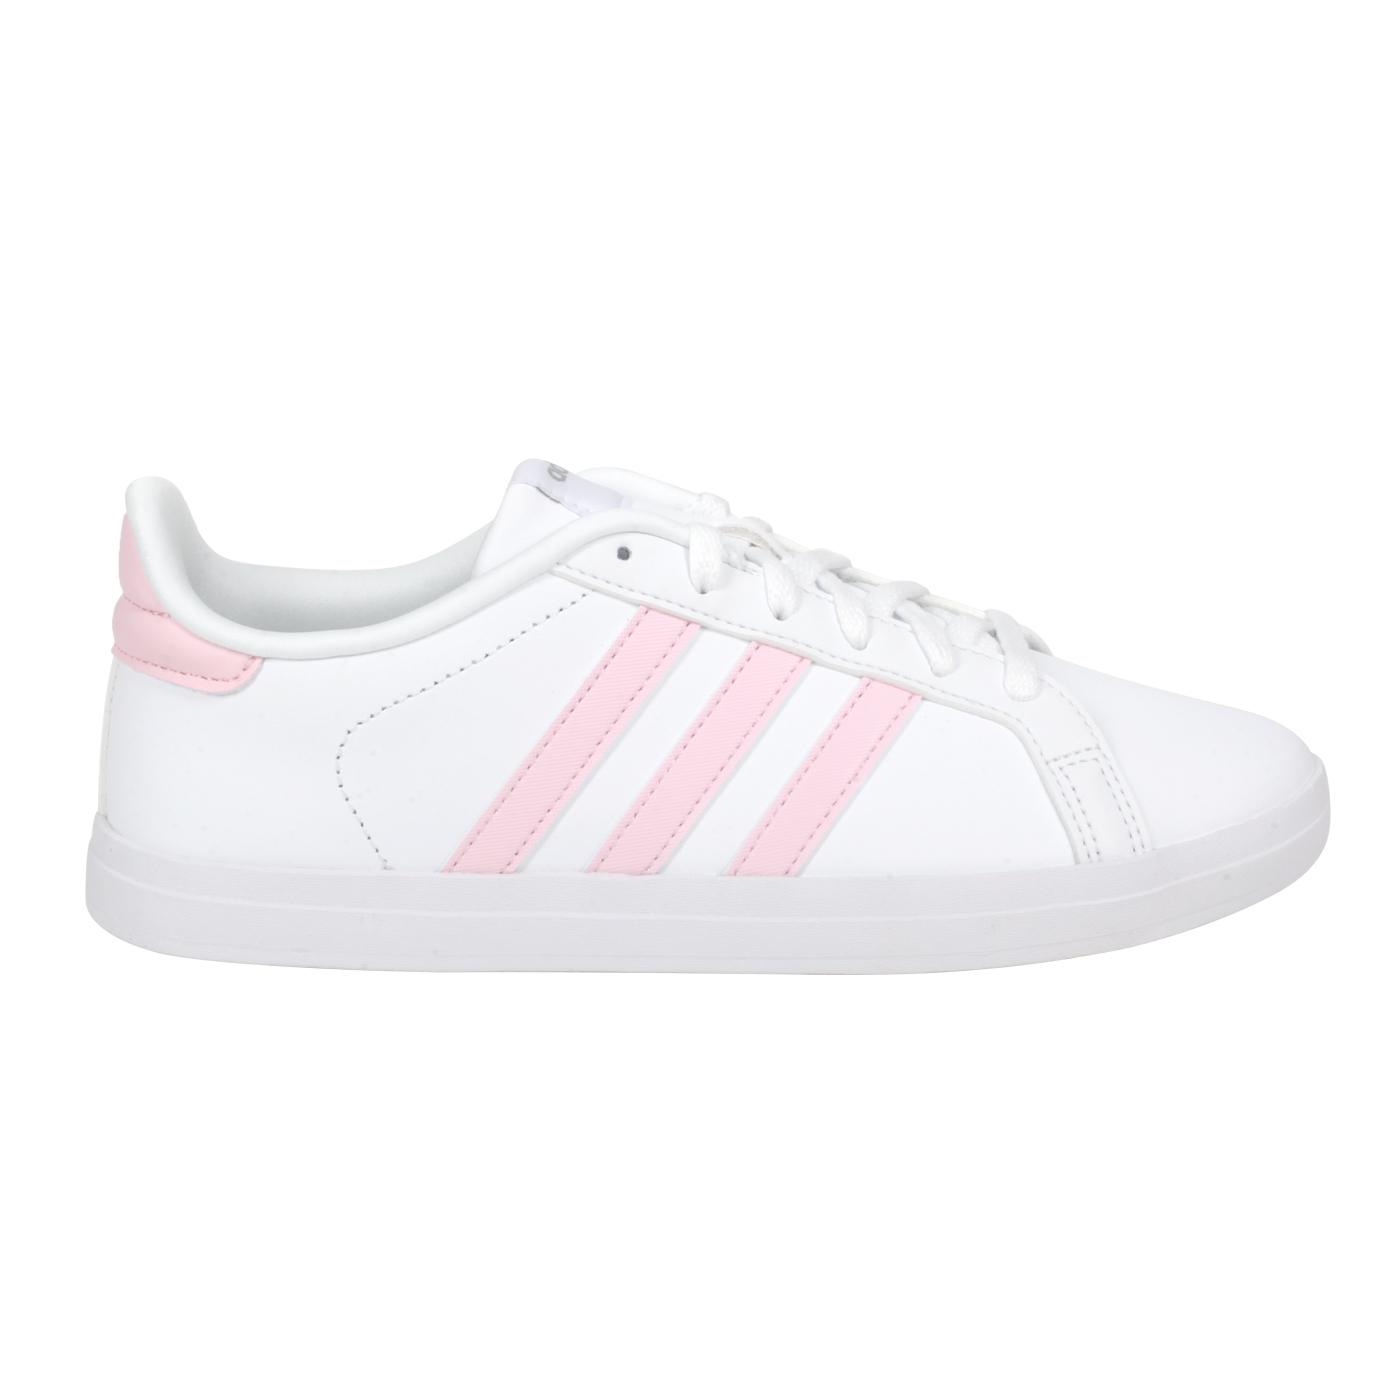 ADIDAS 女款休閒鞋 FY6950 - 白粉